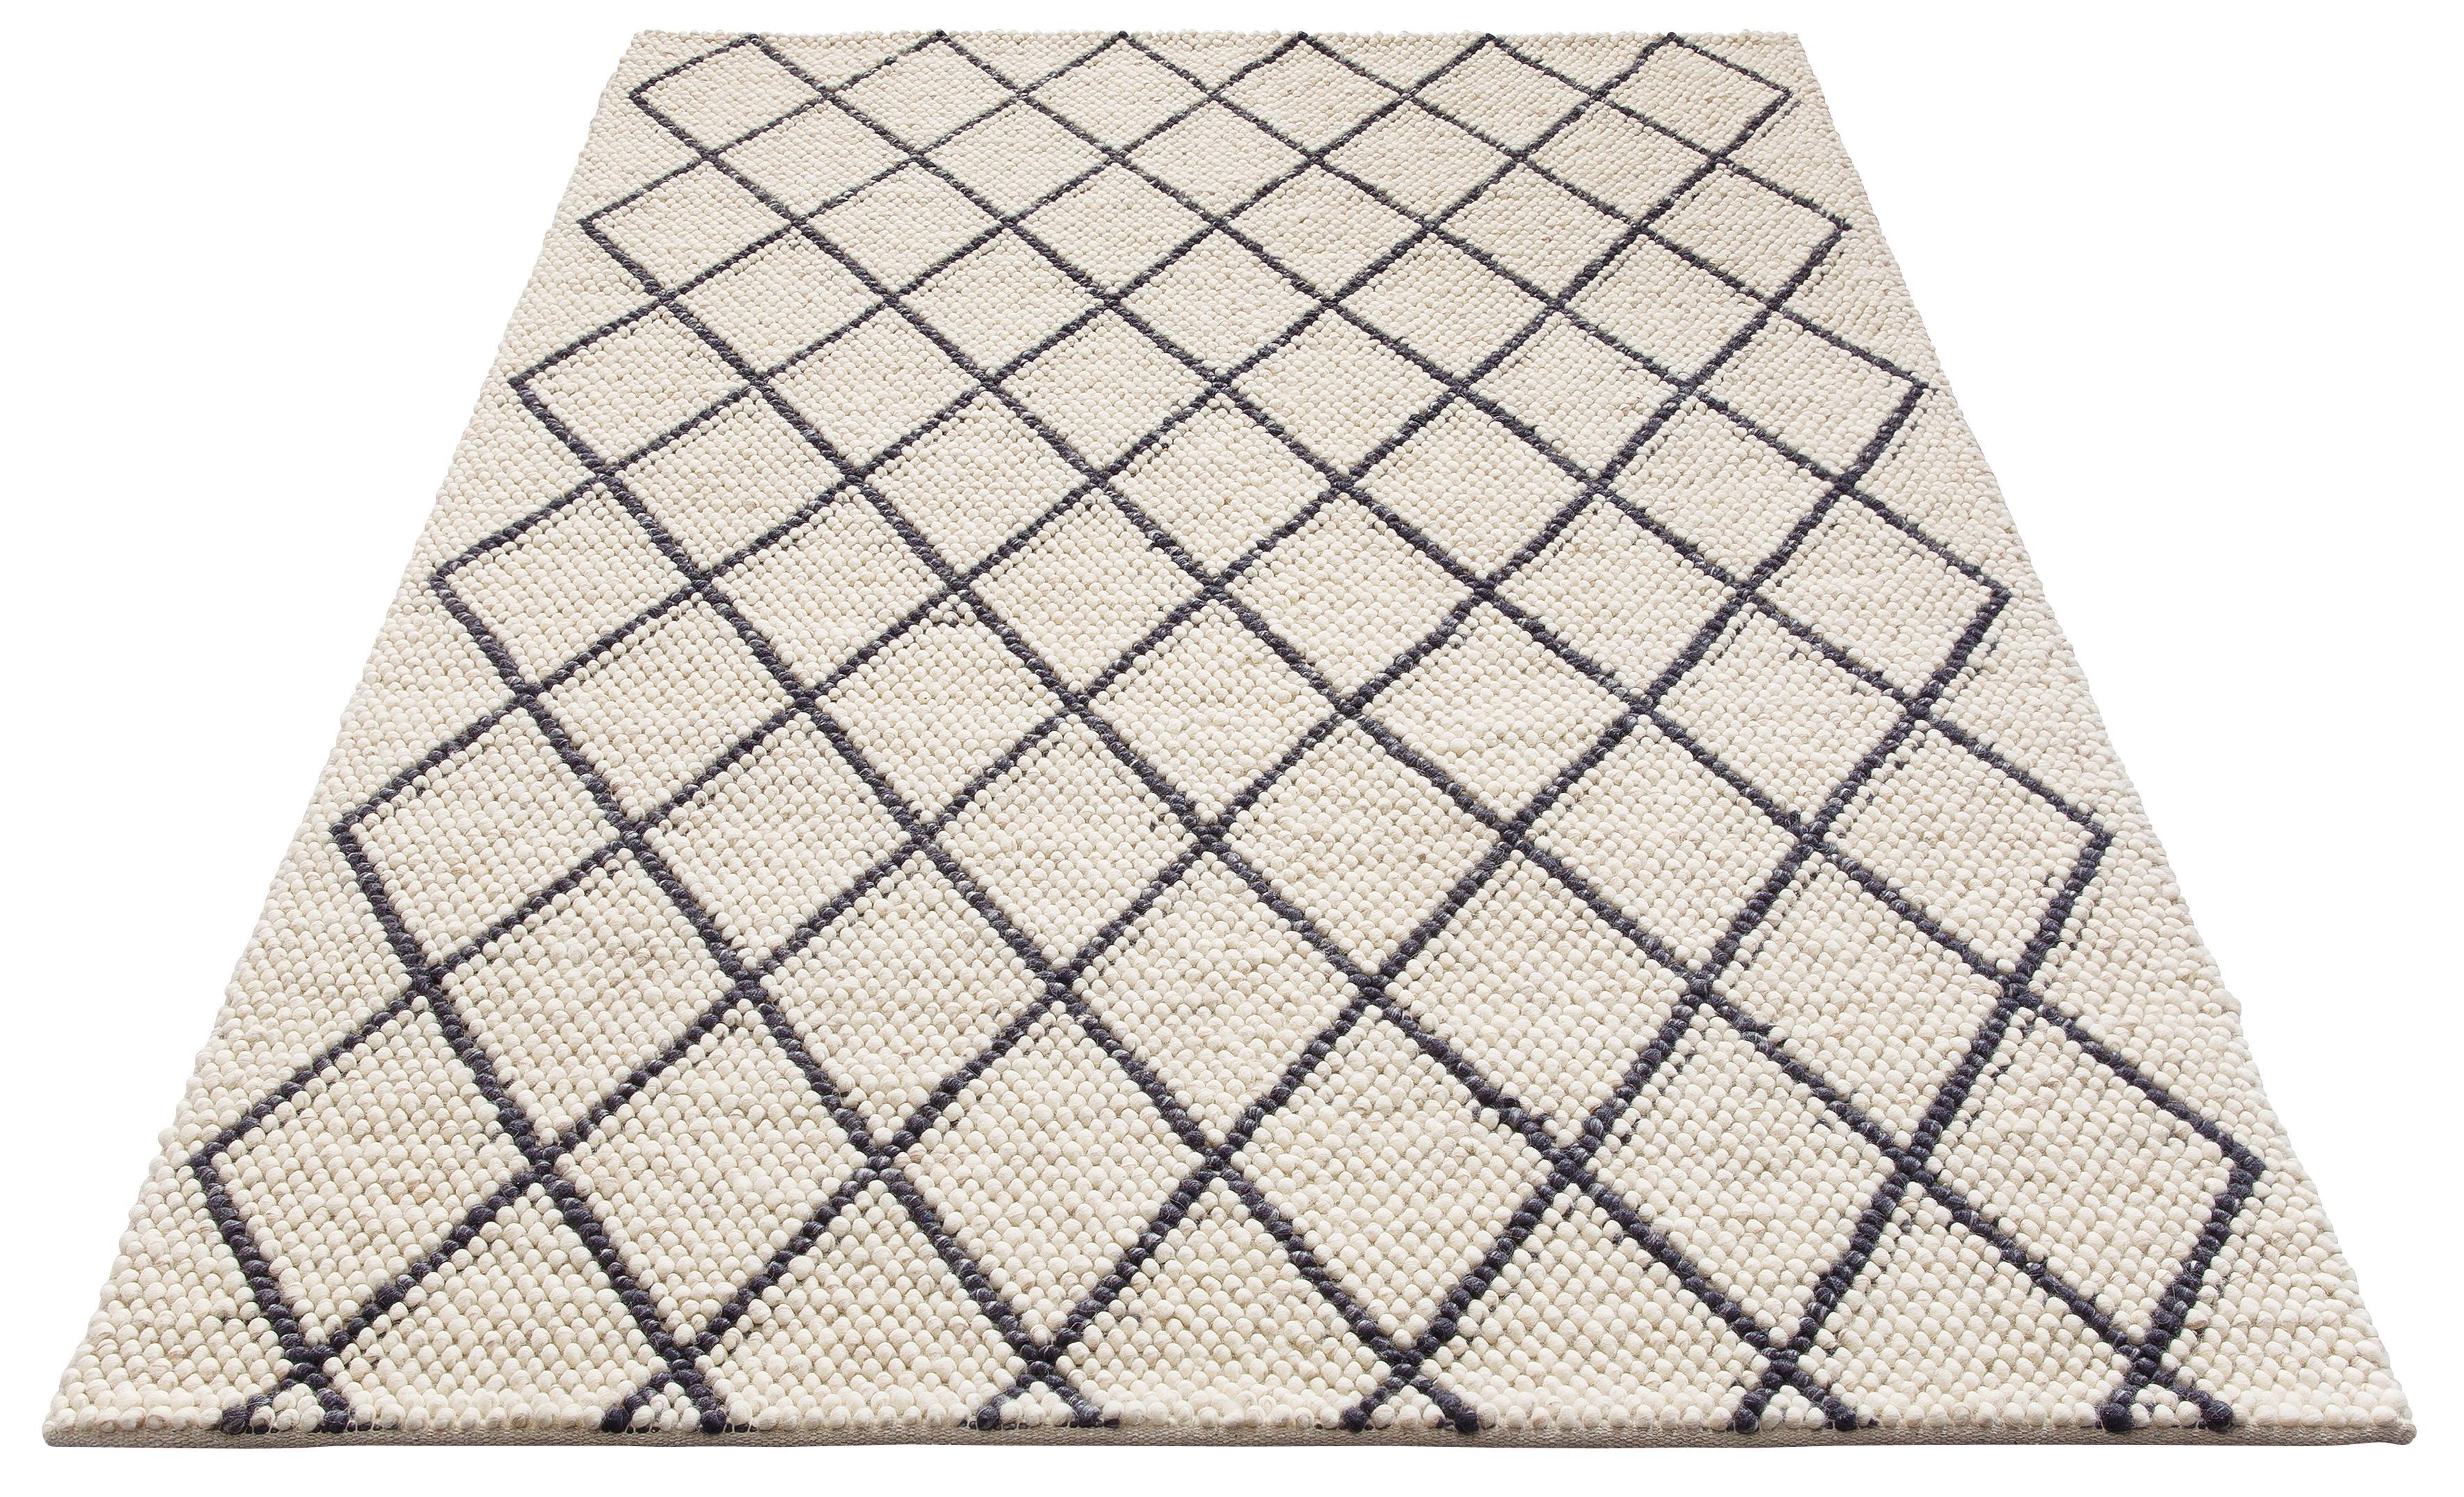 Teppich Lior my home rechteckig Höhe 10 mm handgewebt